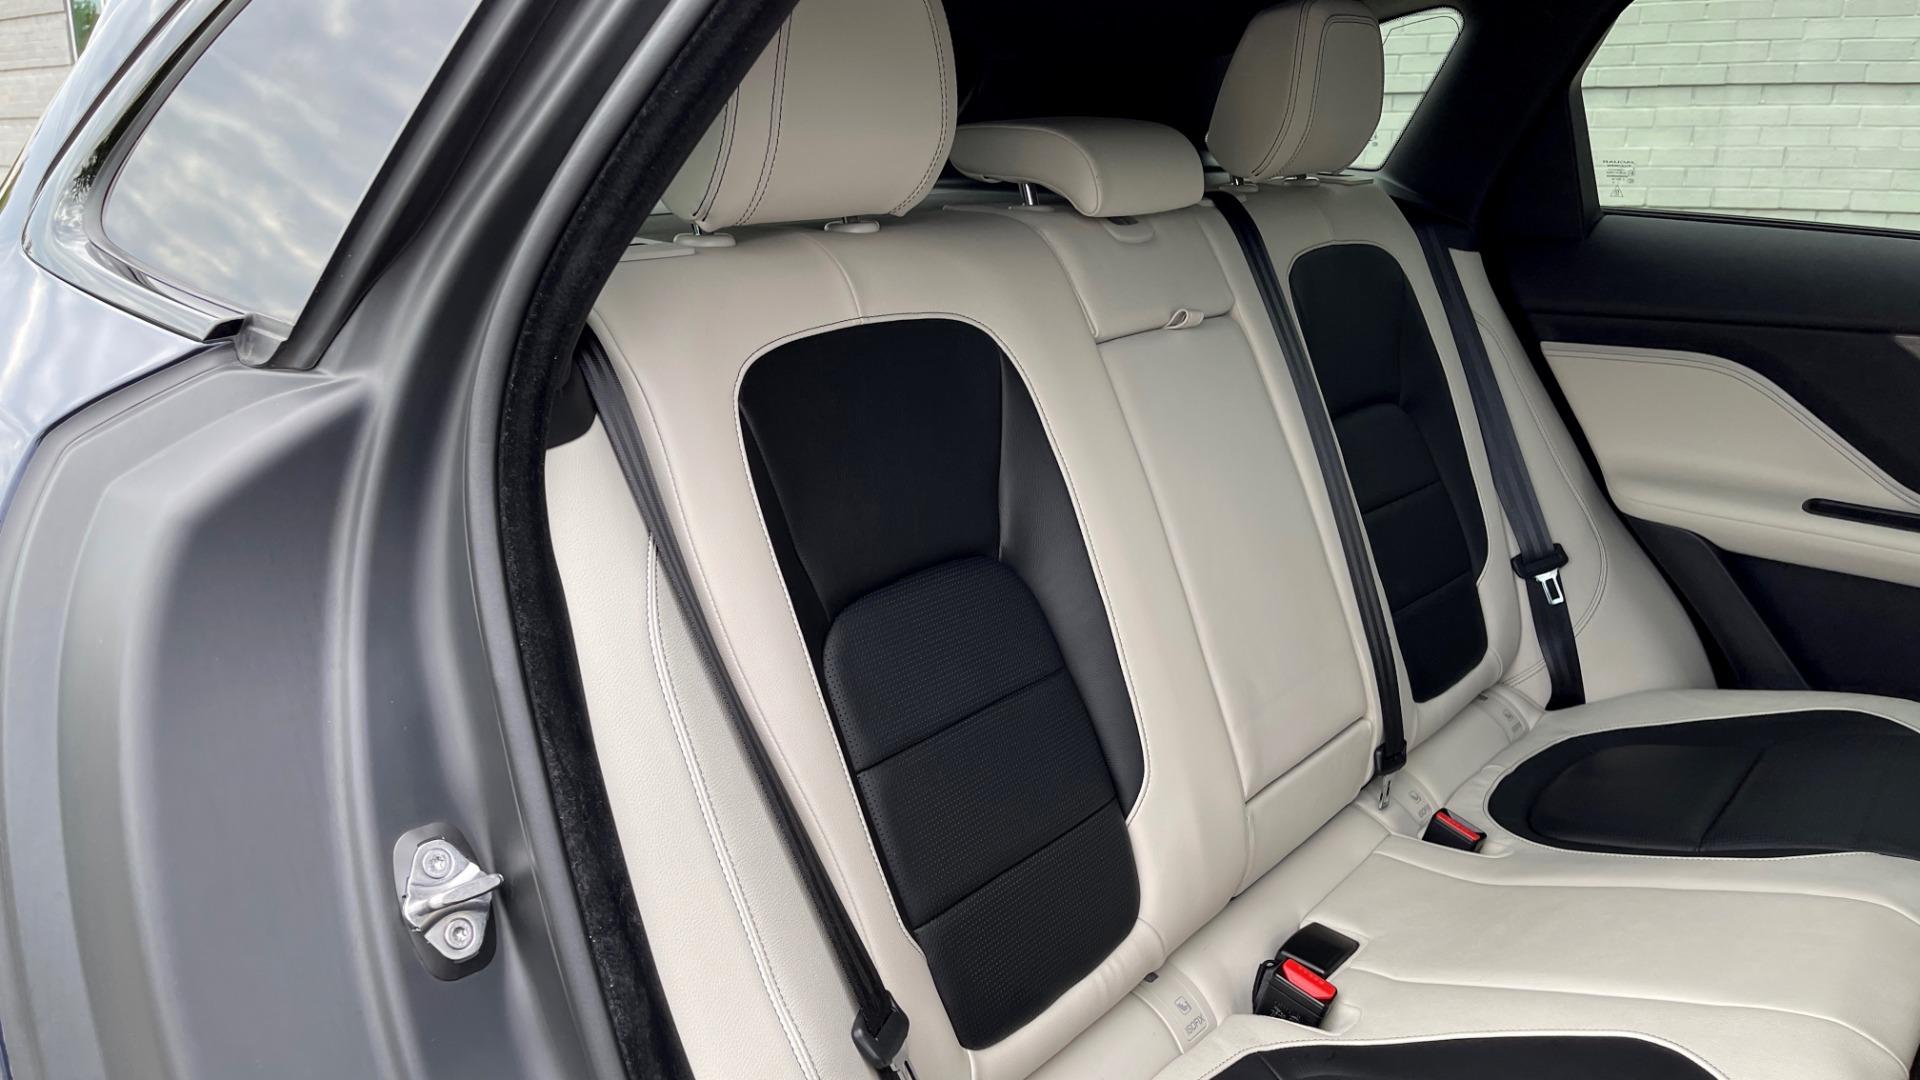 Used 2019 Jaguar F-PACE S / DRIVE PKG / BSA / HUD / BLACK EXT PKG / REARVIEW for sale $50,995 at Formula Imports in Charlotte NC 28227 60